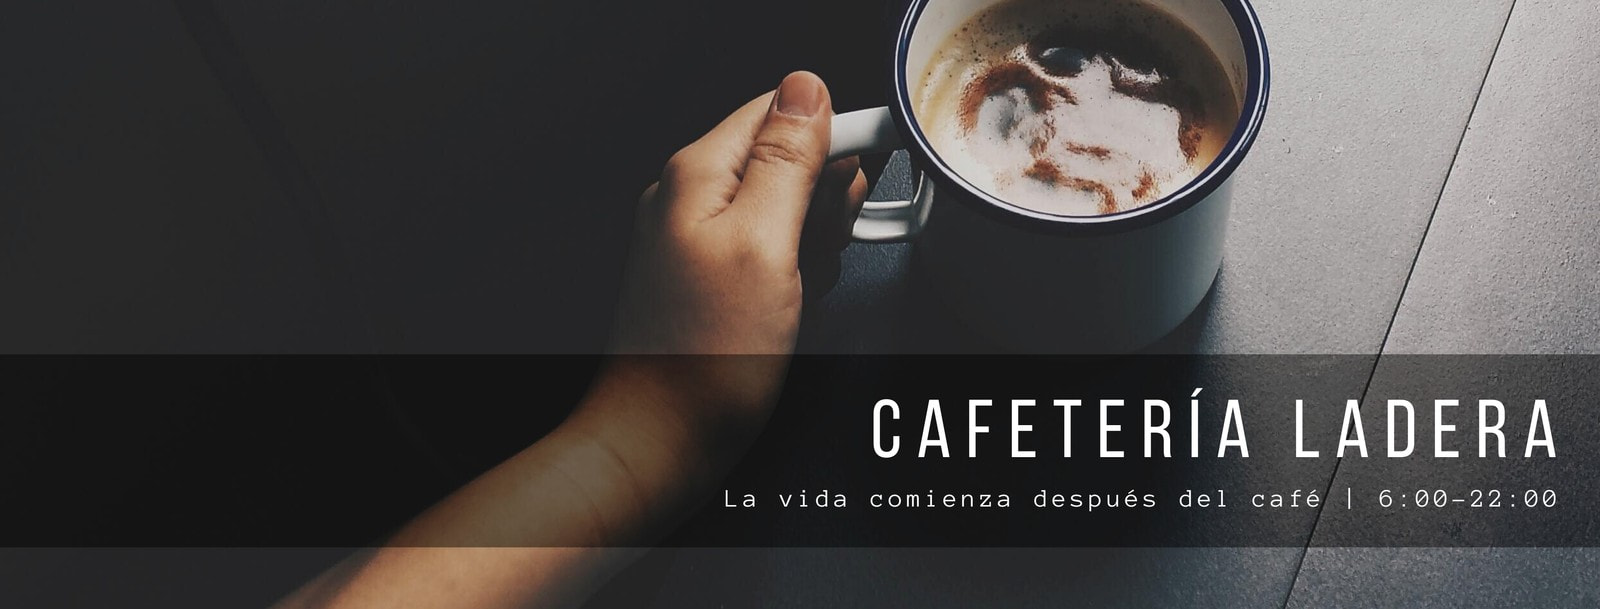 Gris Temática de Café Portada de Facebook